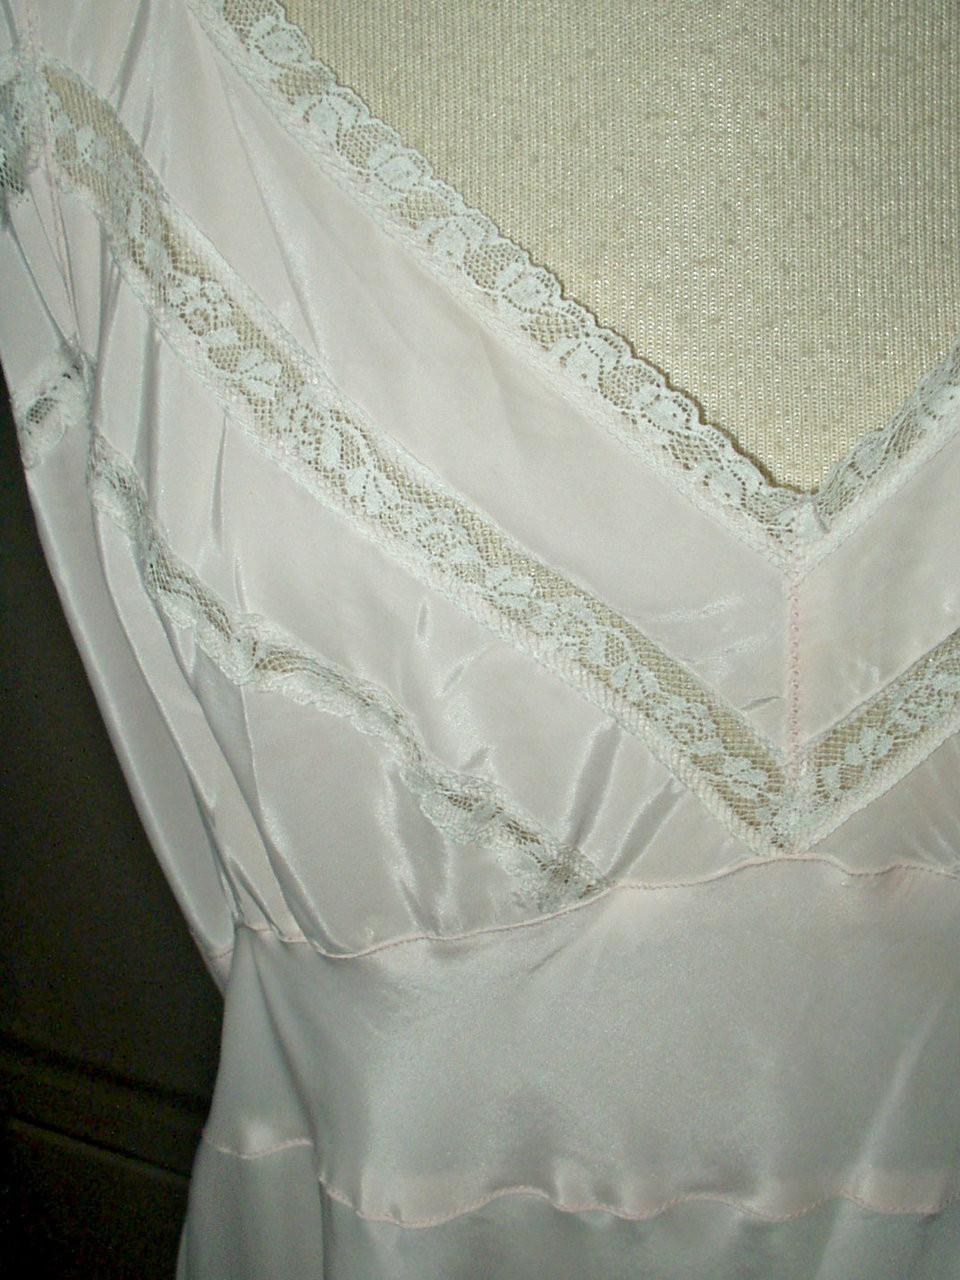 Vintage 1940 1950 Pink Bias Cut Rayon Nightgown Alberta Lingerie Label